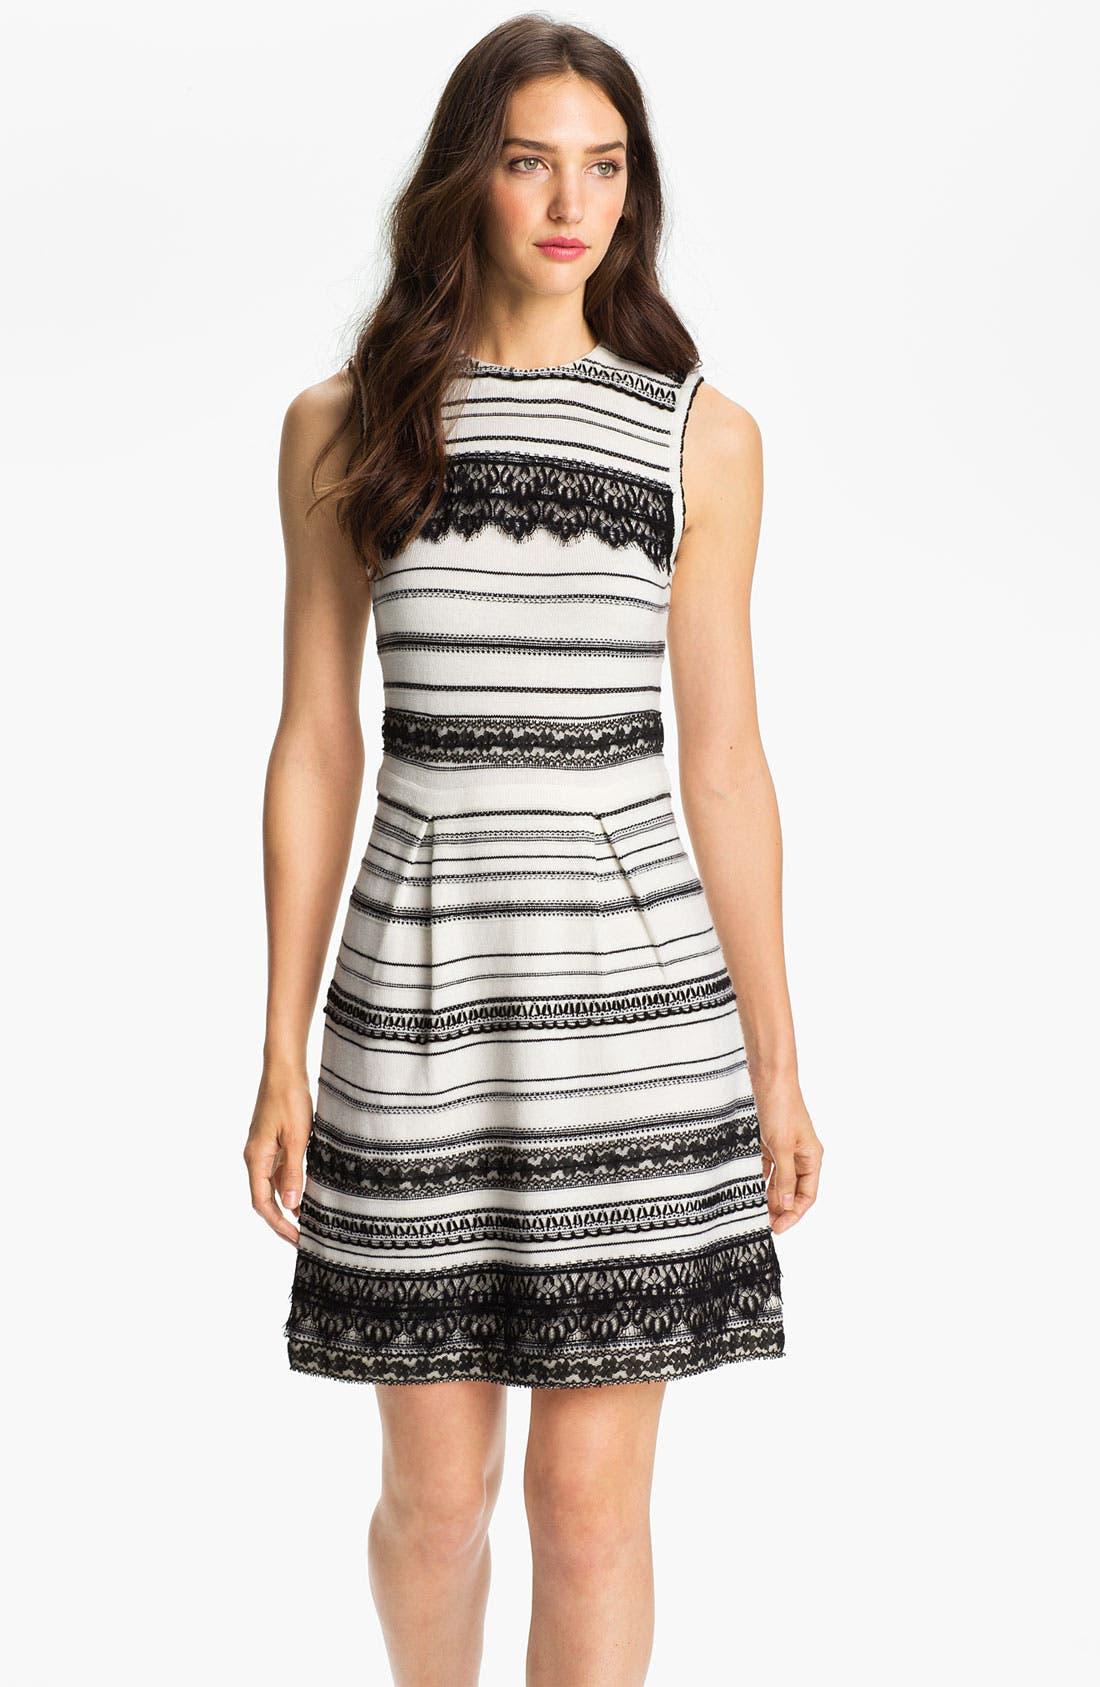 Main Image - Nanette Lepore 'Peace & Soul' Merino Wool Fit & Flare Dress